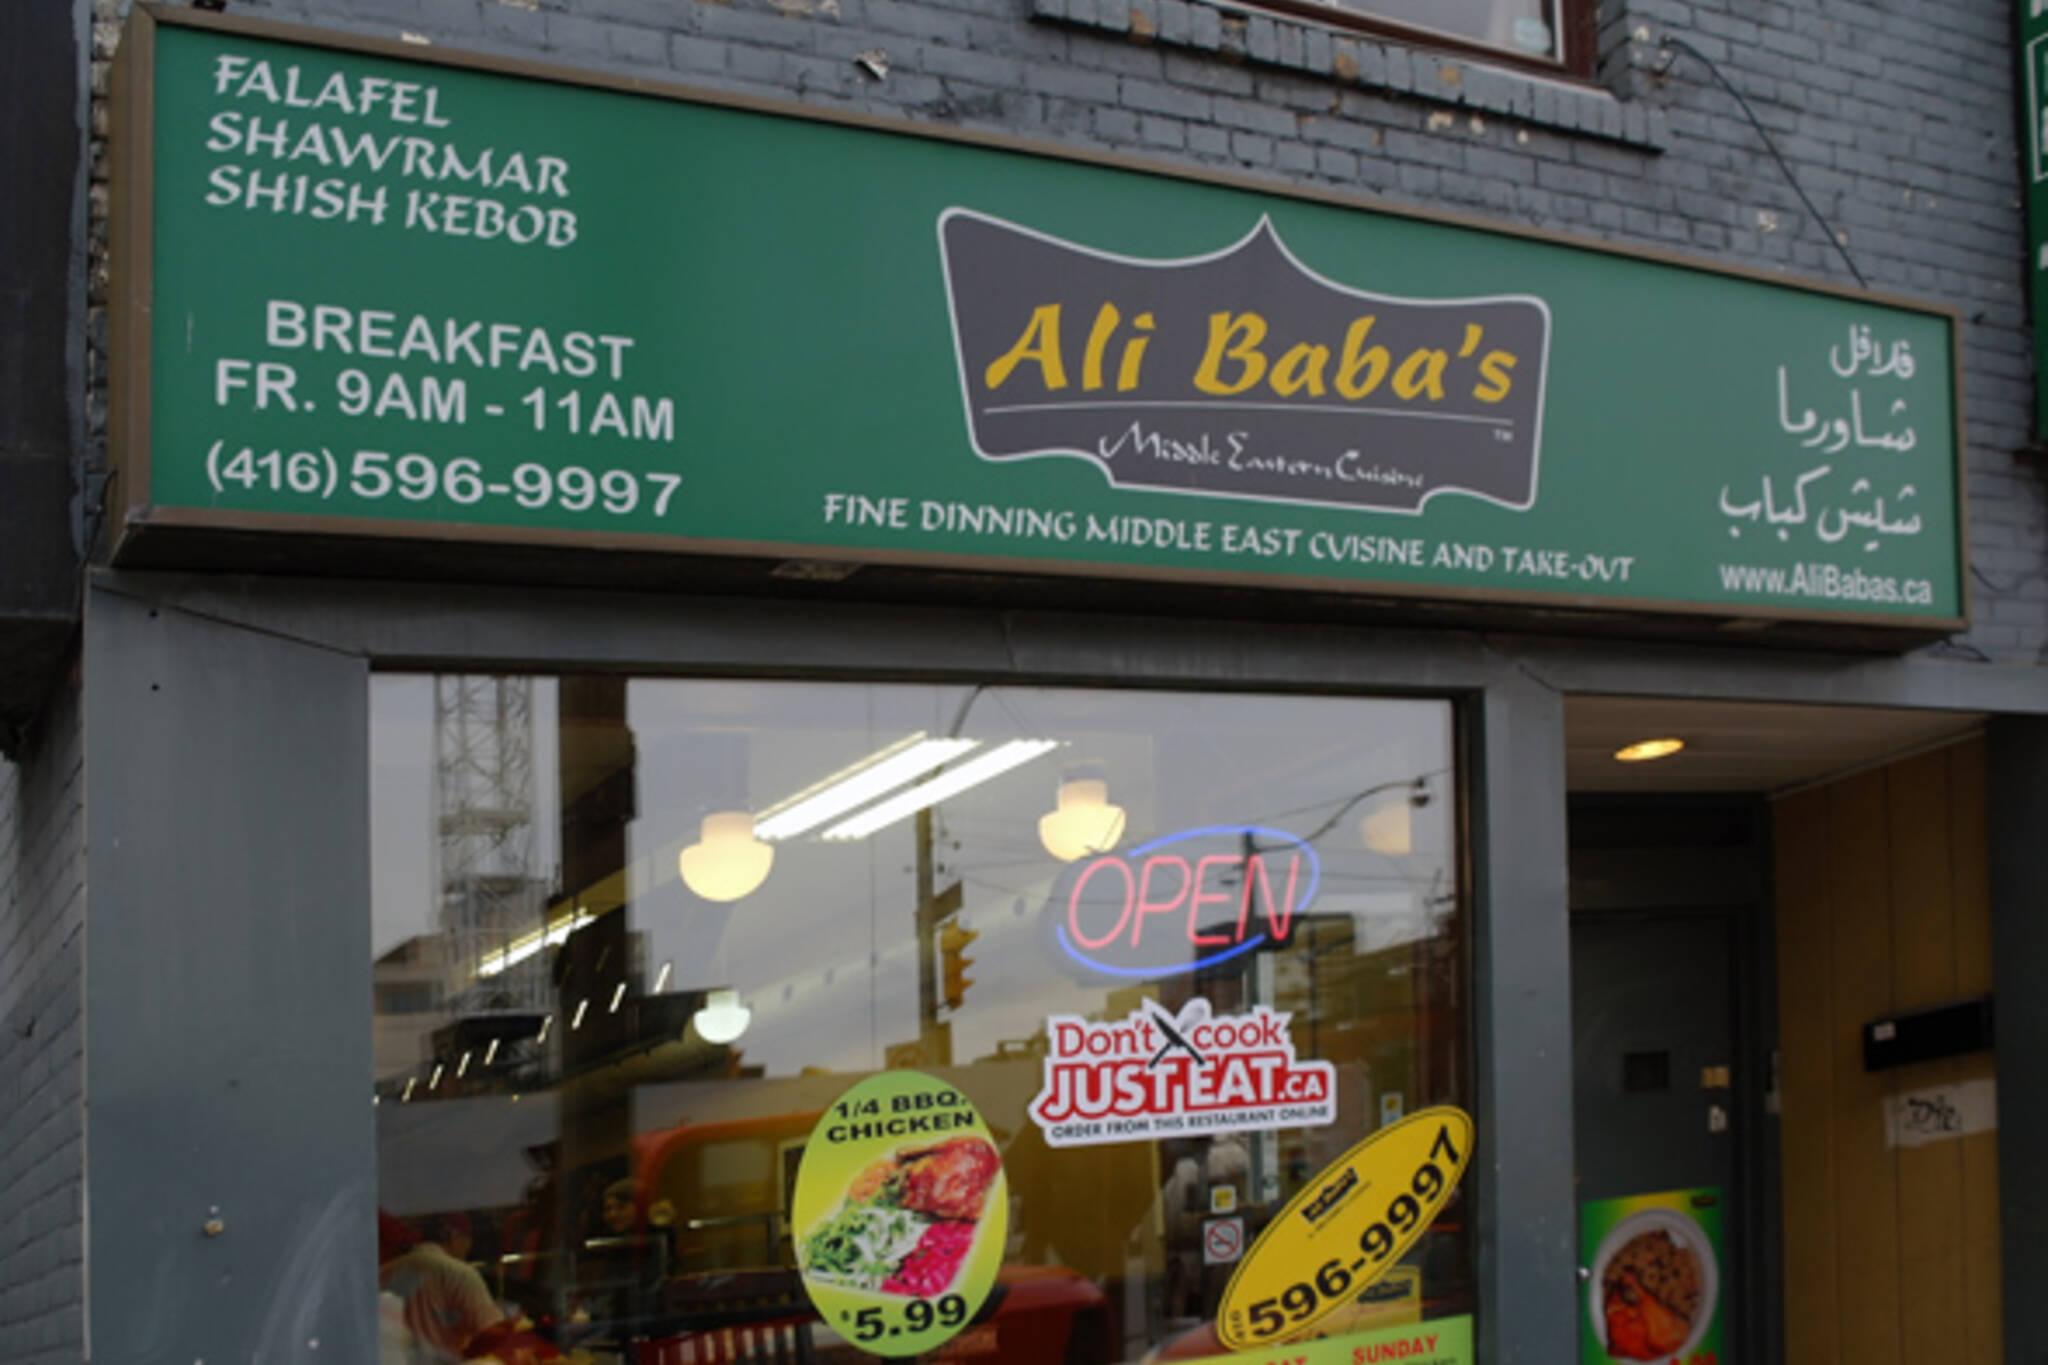 Ali Baba Toronto